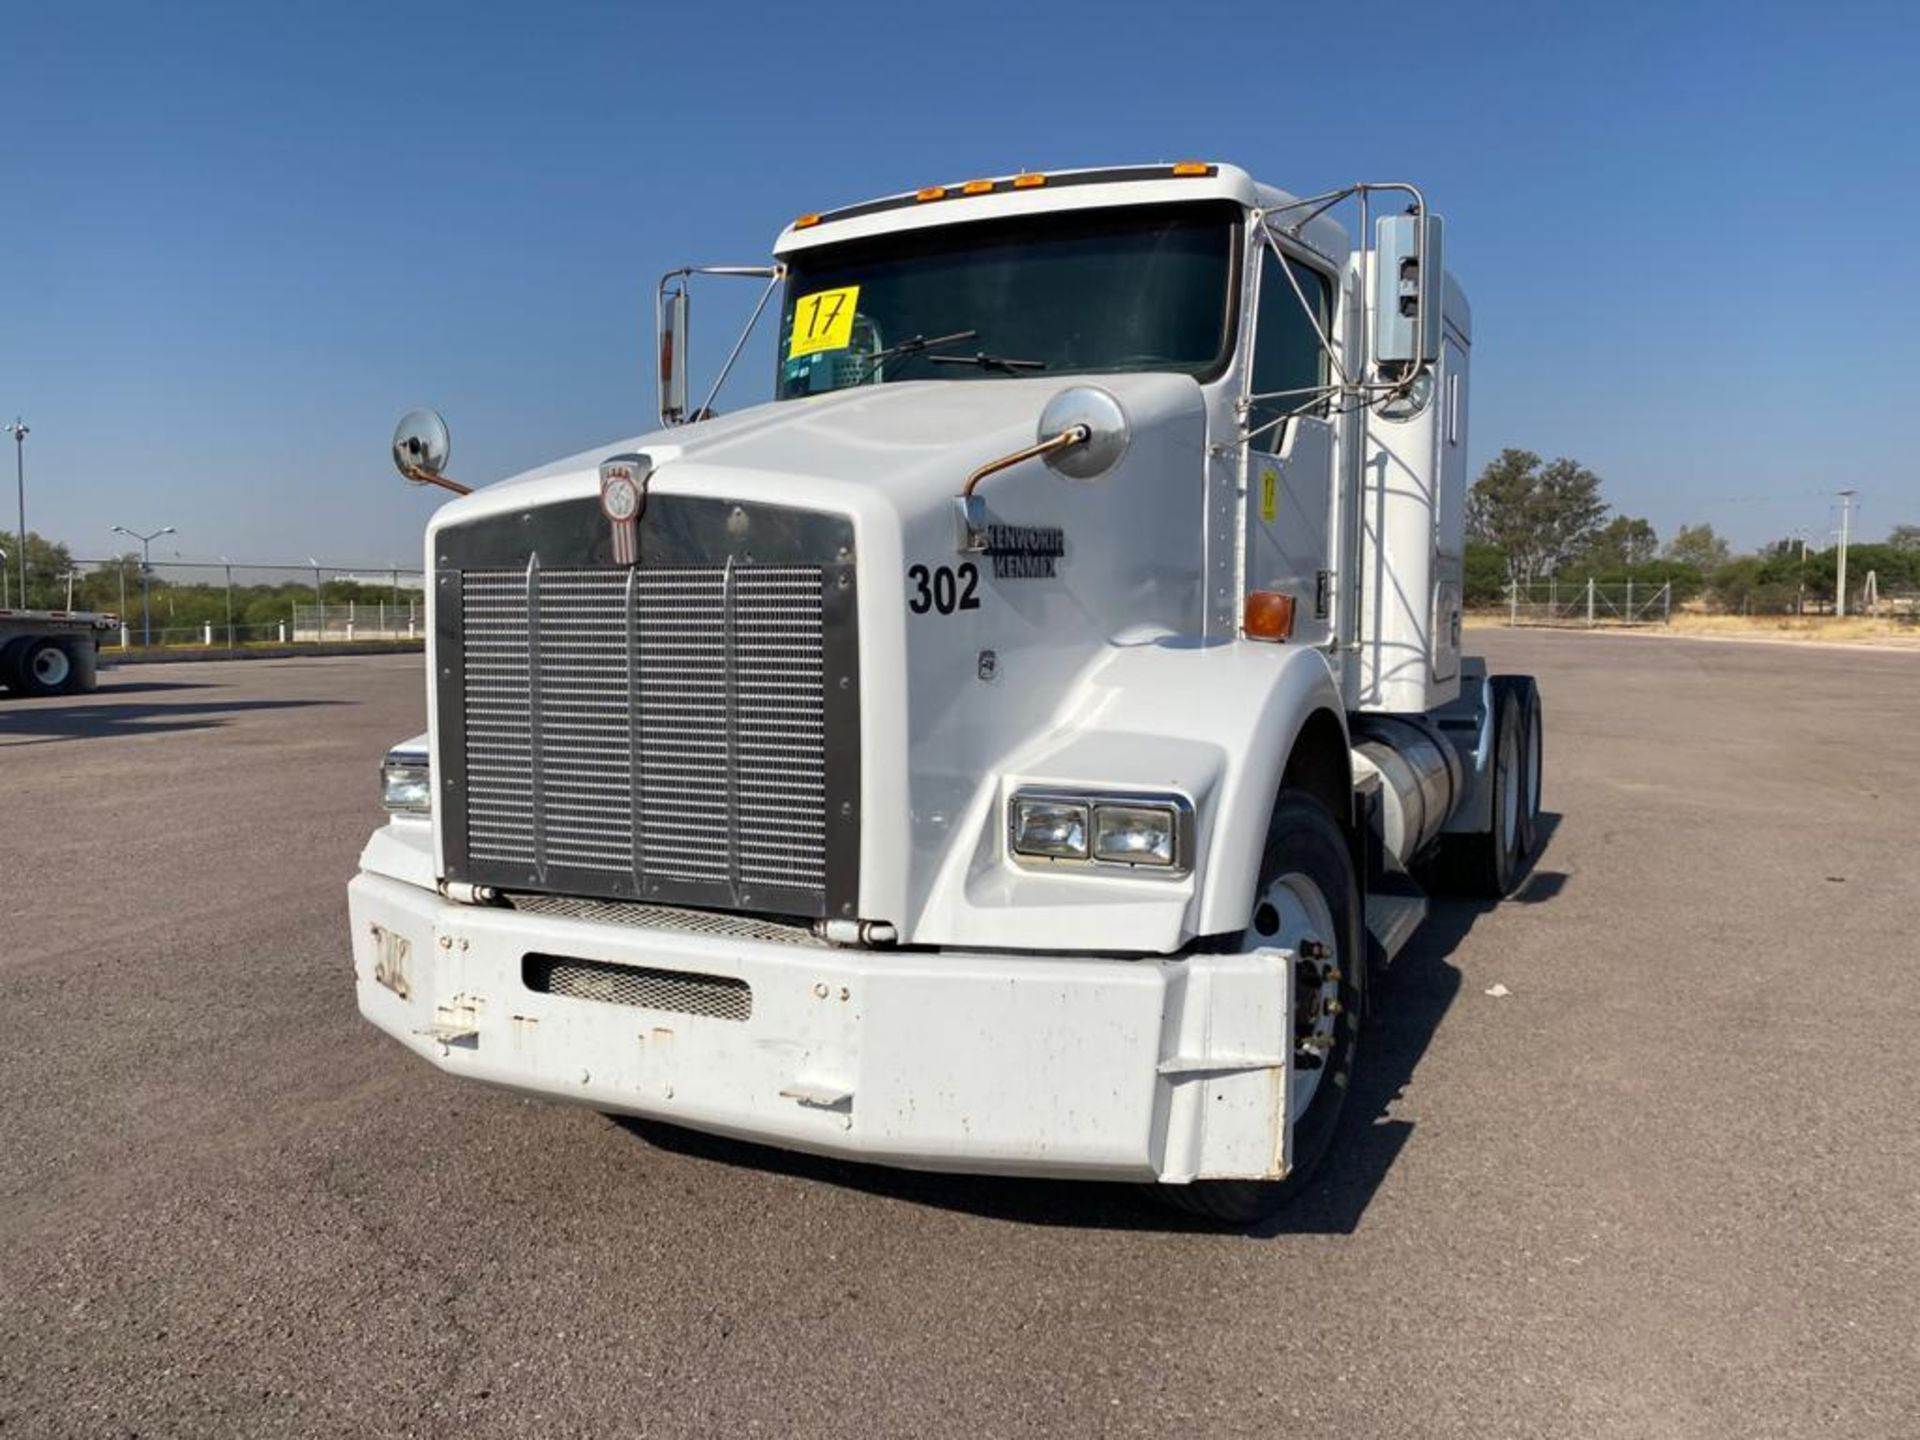 1998 Kenworth Sleeper Truck Tractor, standard transmission of 18 speeds - Image 5 of 55